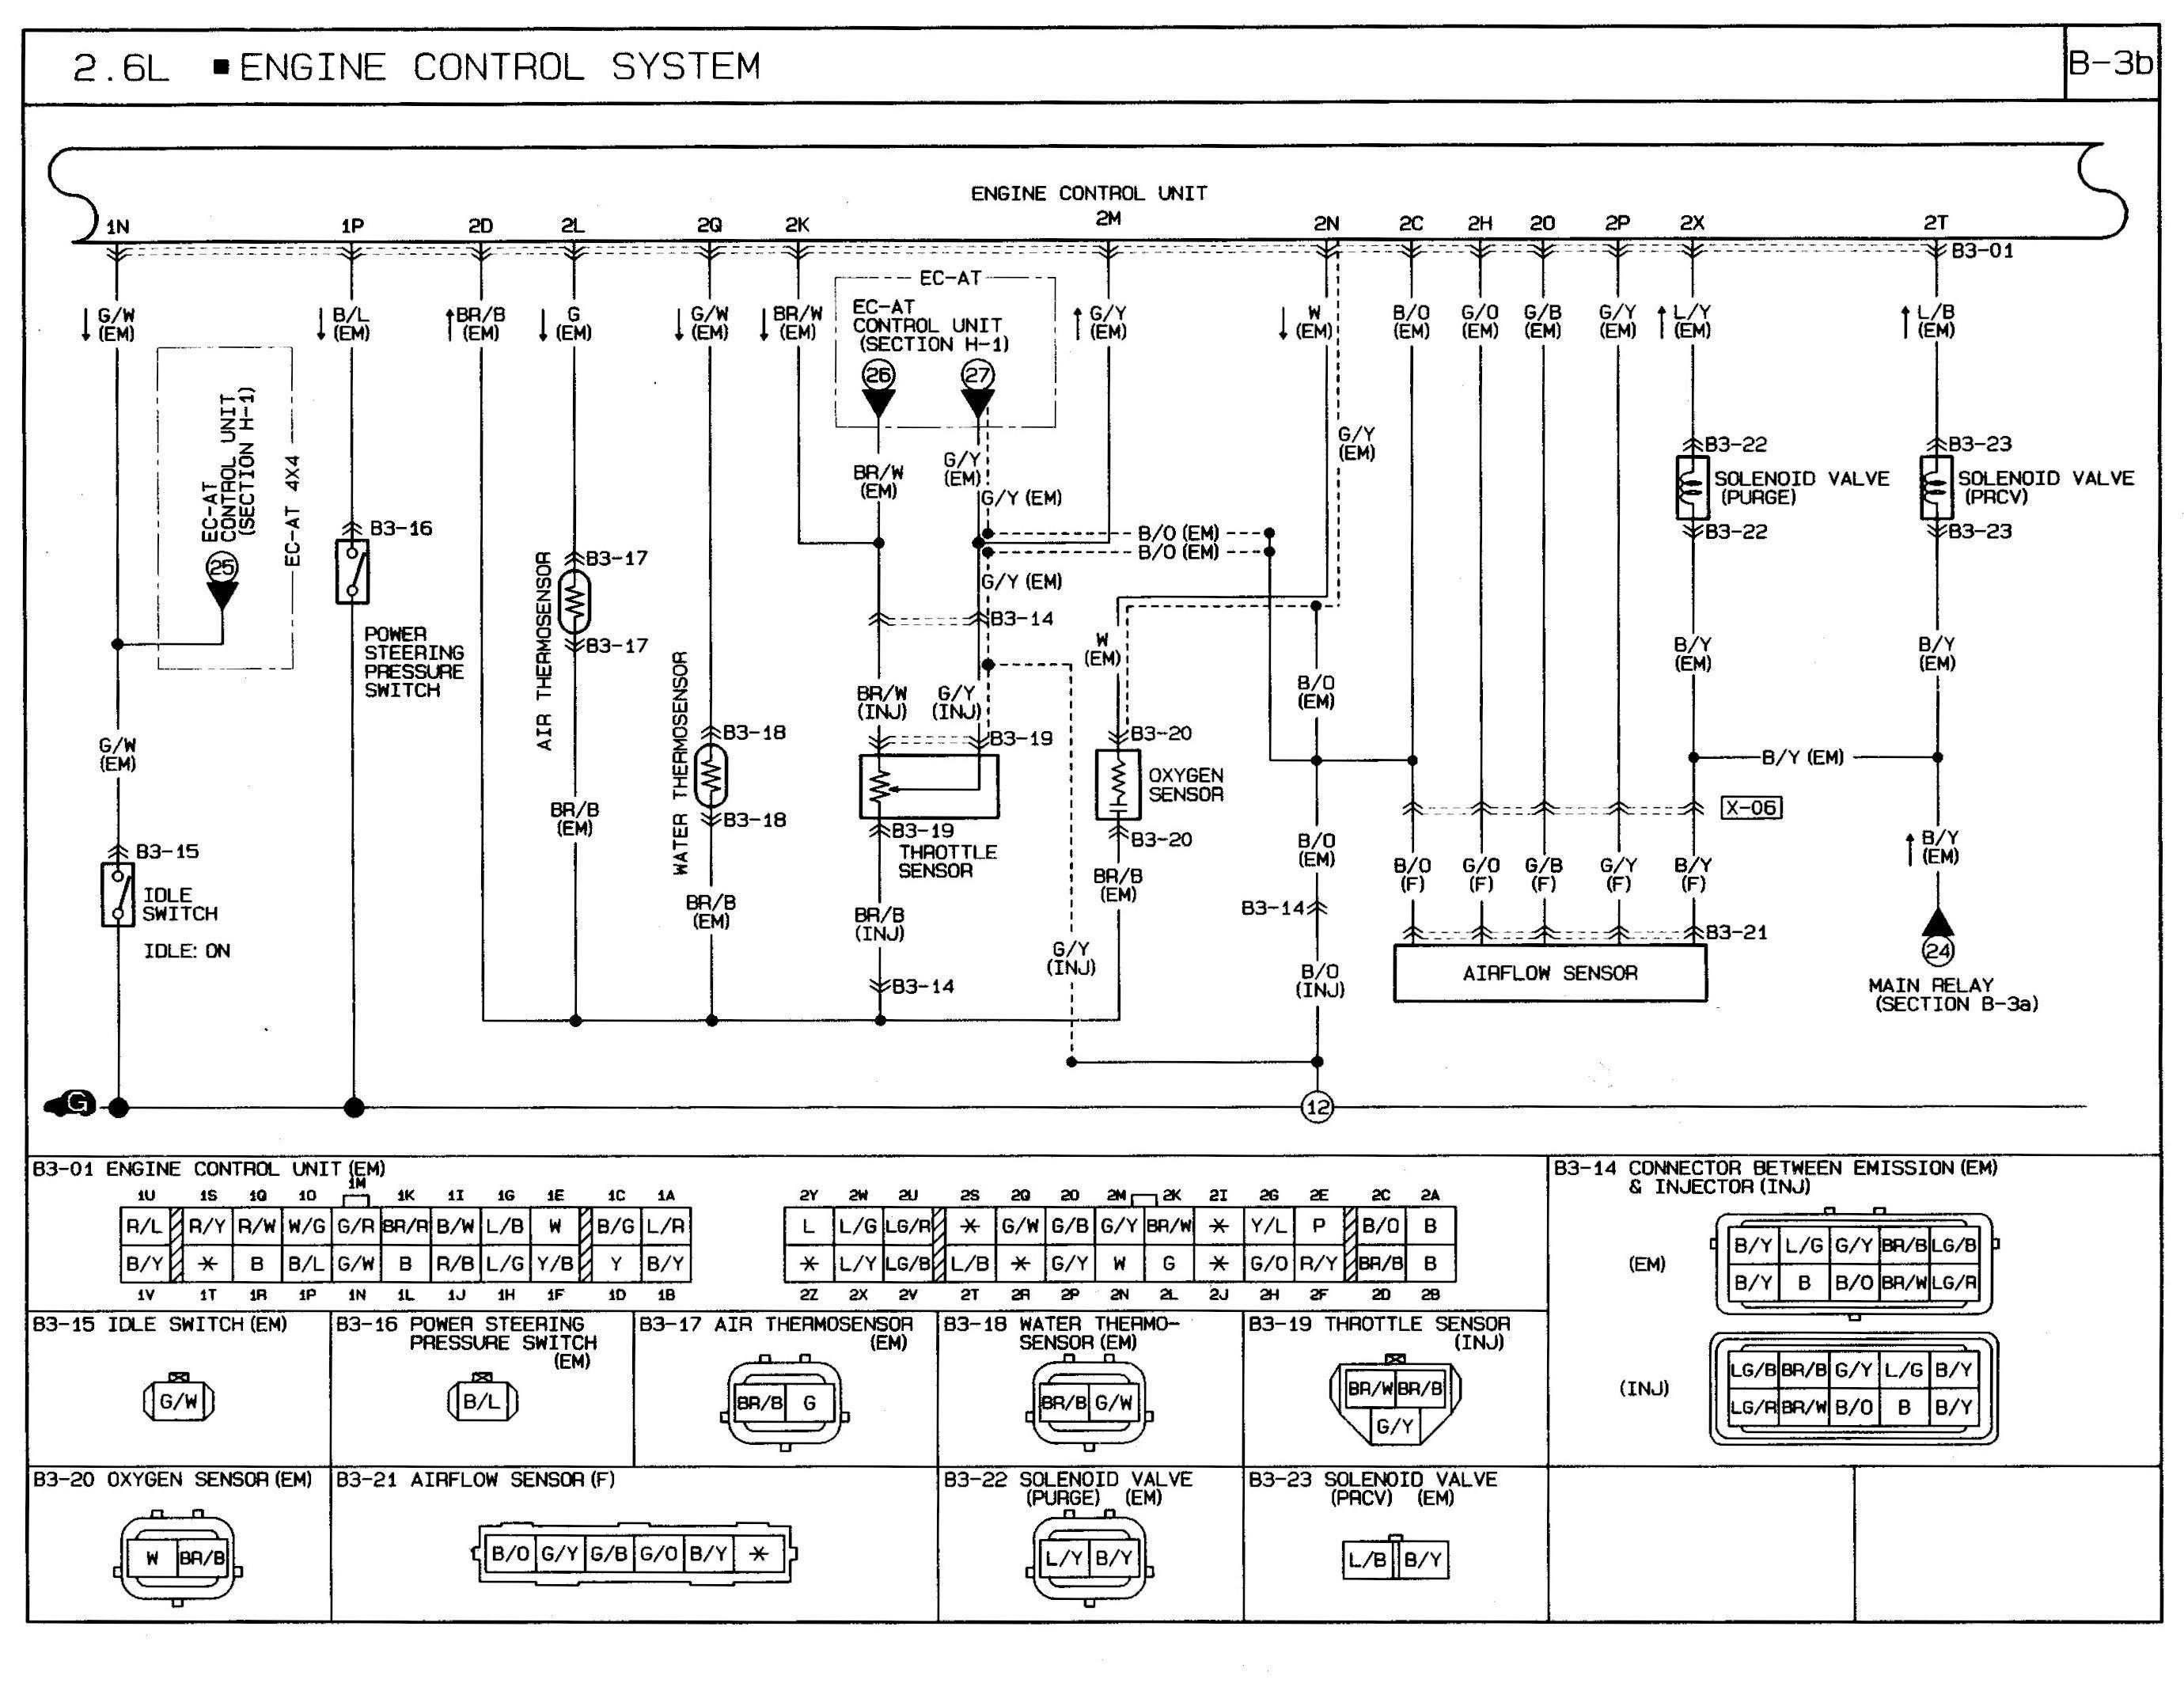 John Deere Electrical Bo Wiring Systems 2010 Mazda 2 Wiring Schematics Wiring Diagram Schematic Of John Deere Electrical Bo Wiring Systems